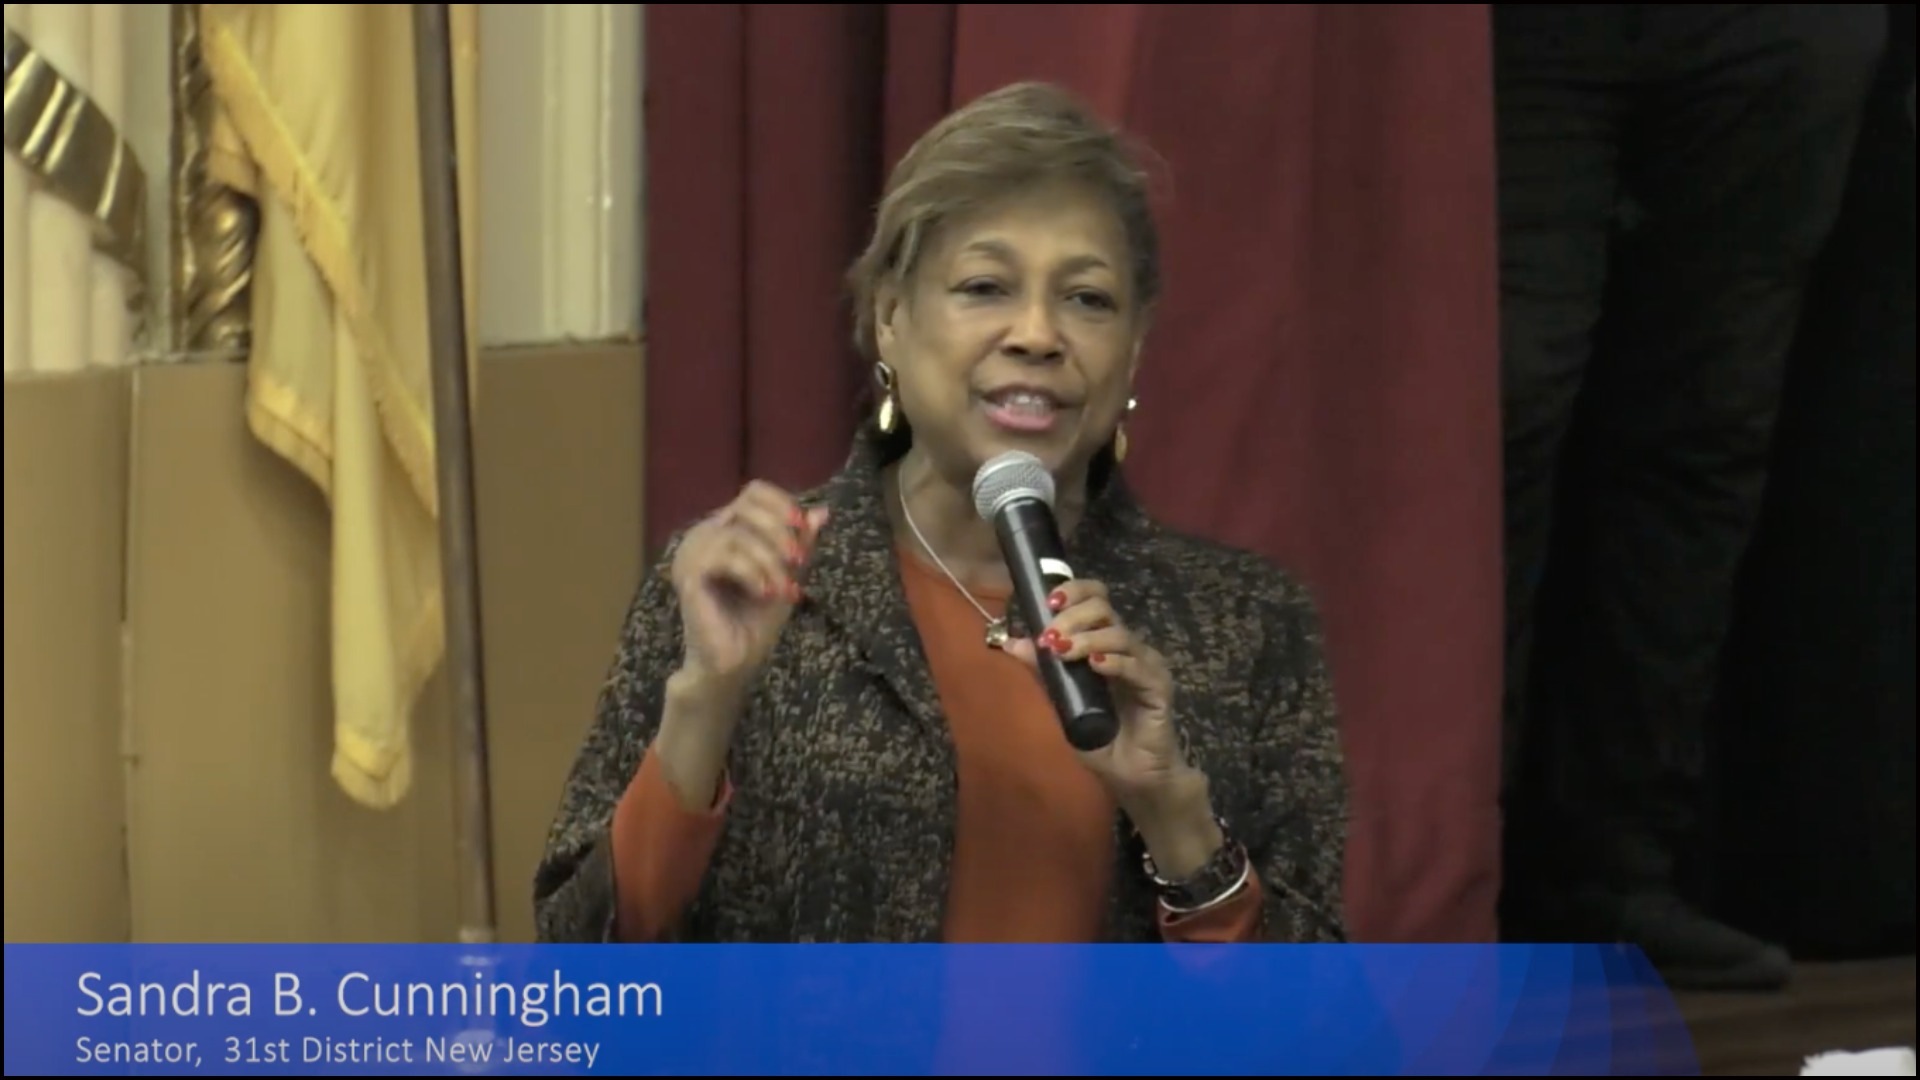 State Sen. Sandra Cunningham